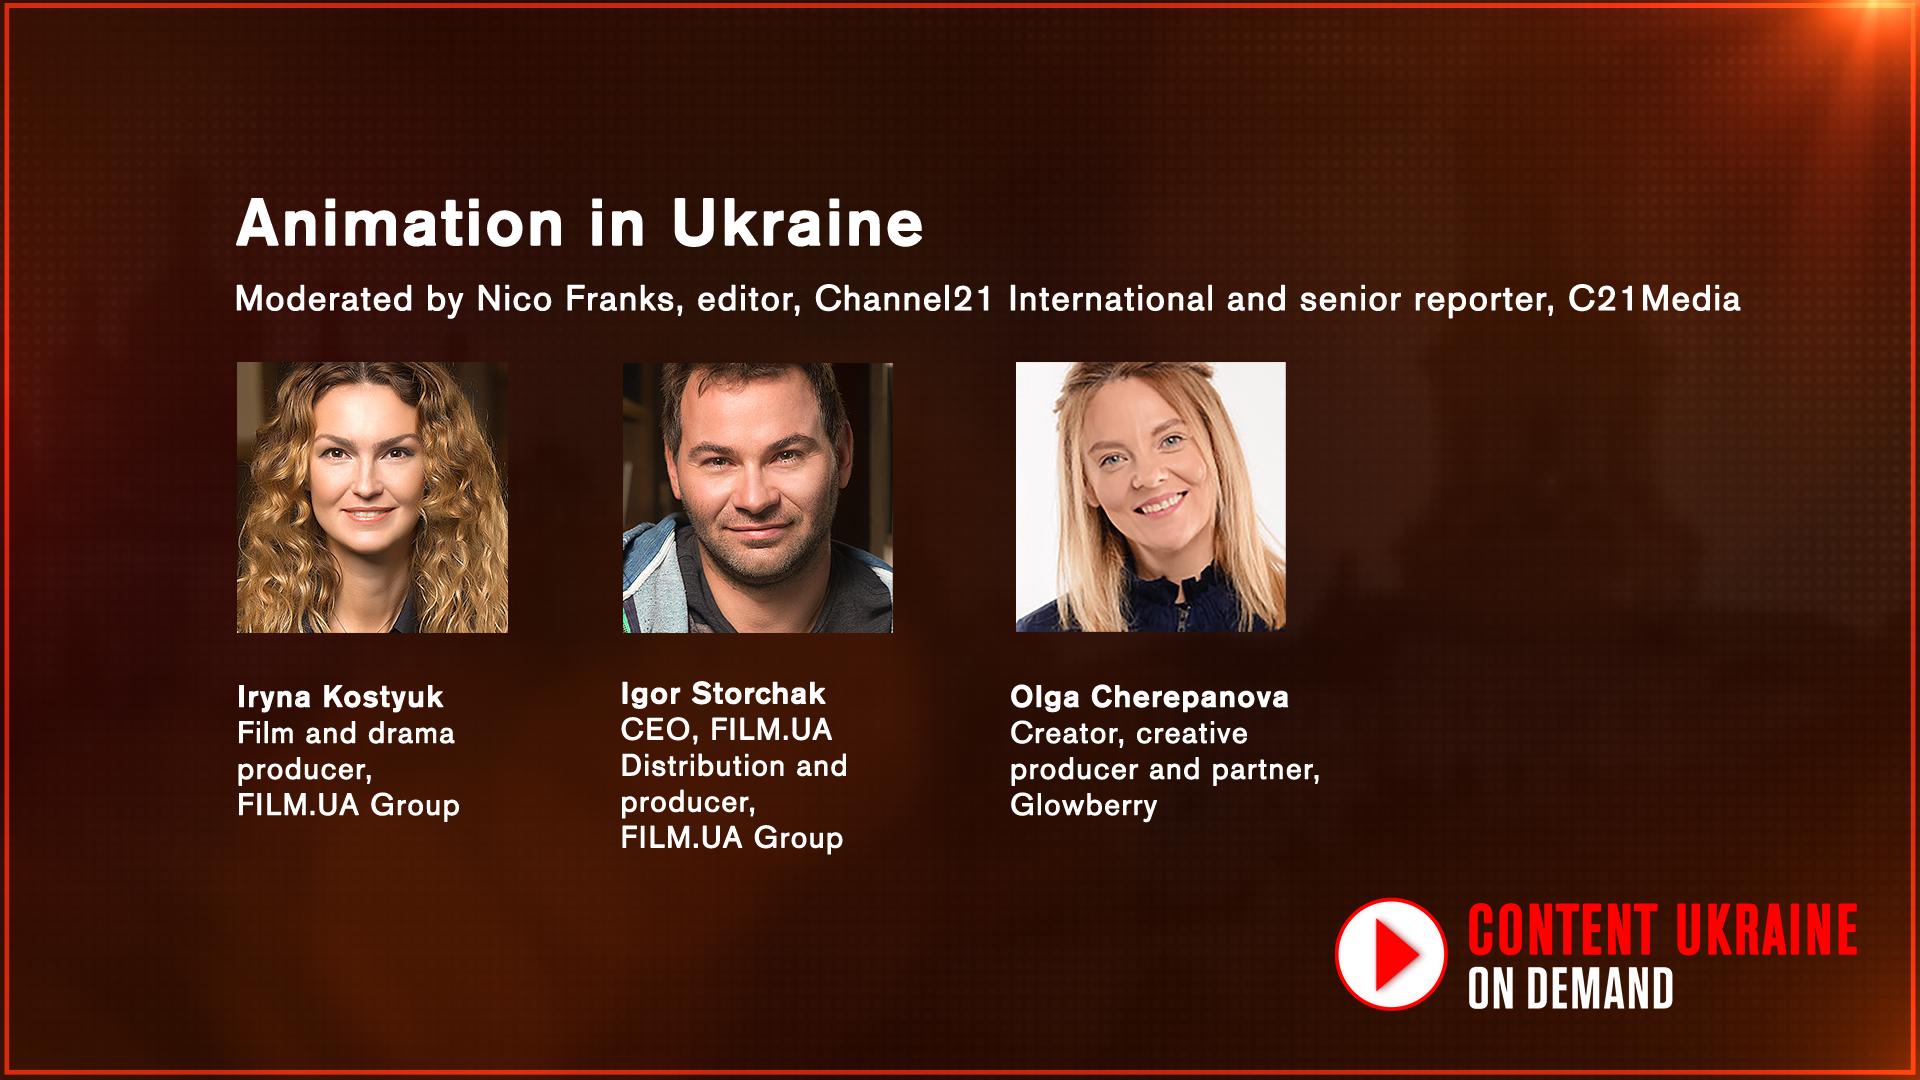 Animation in Ukraine